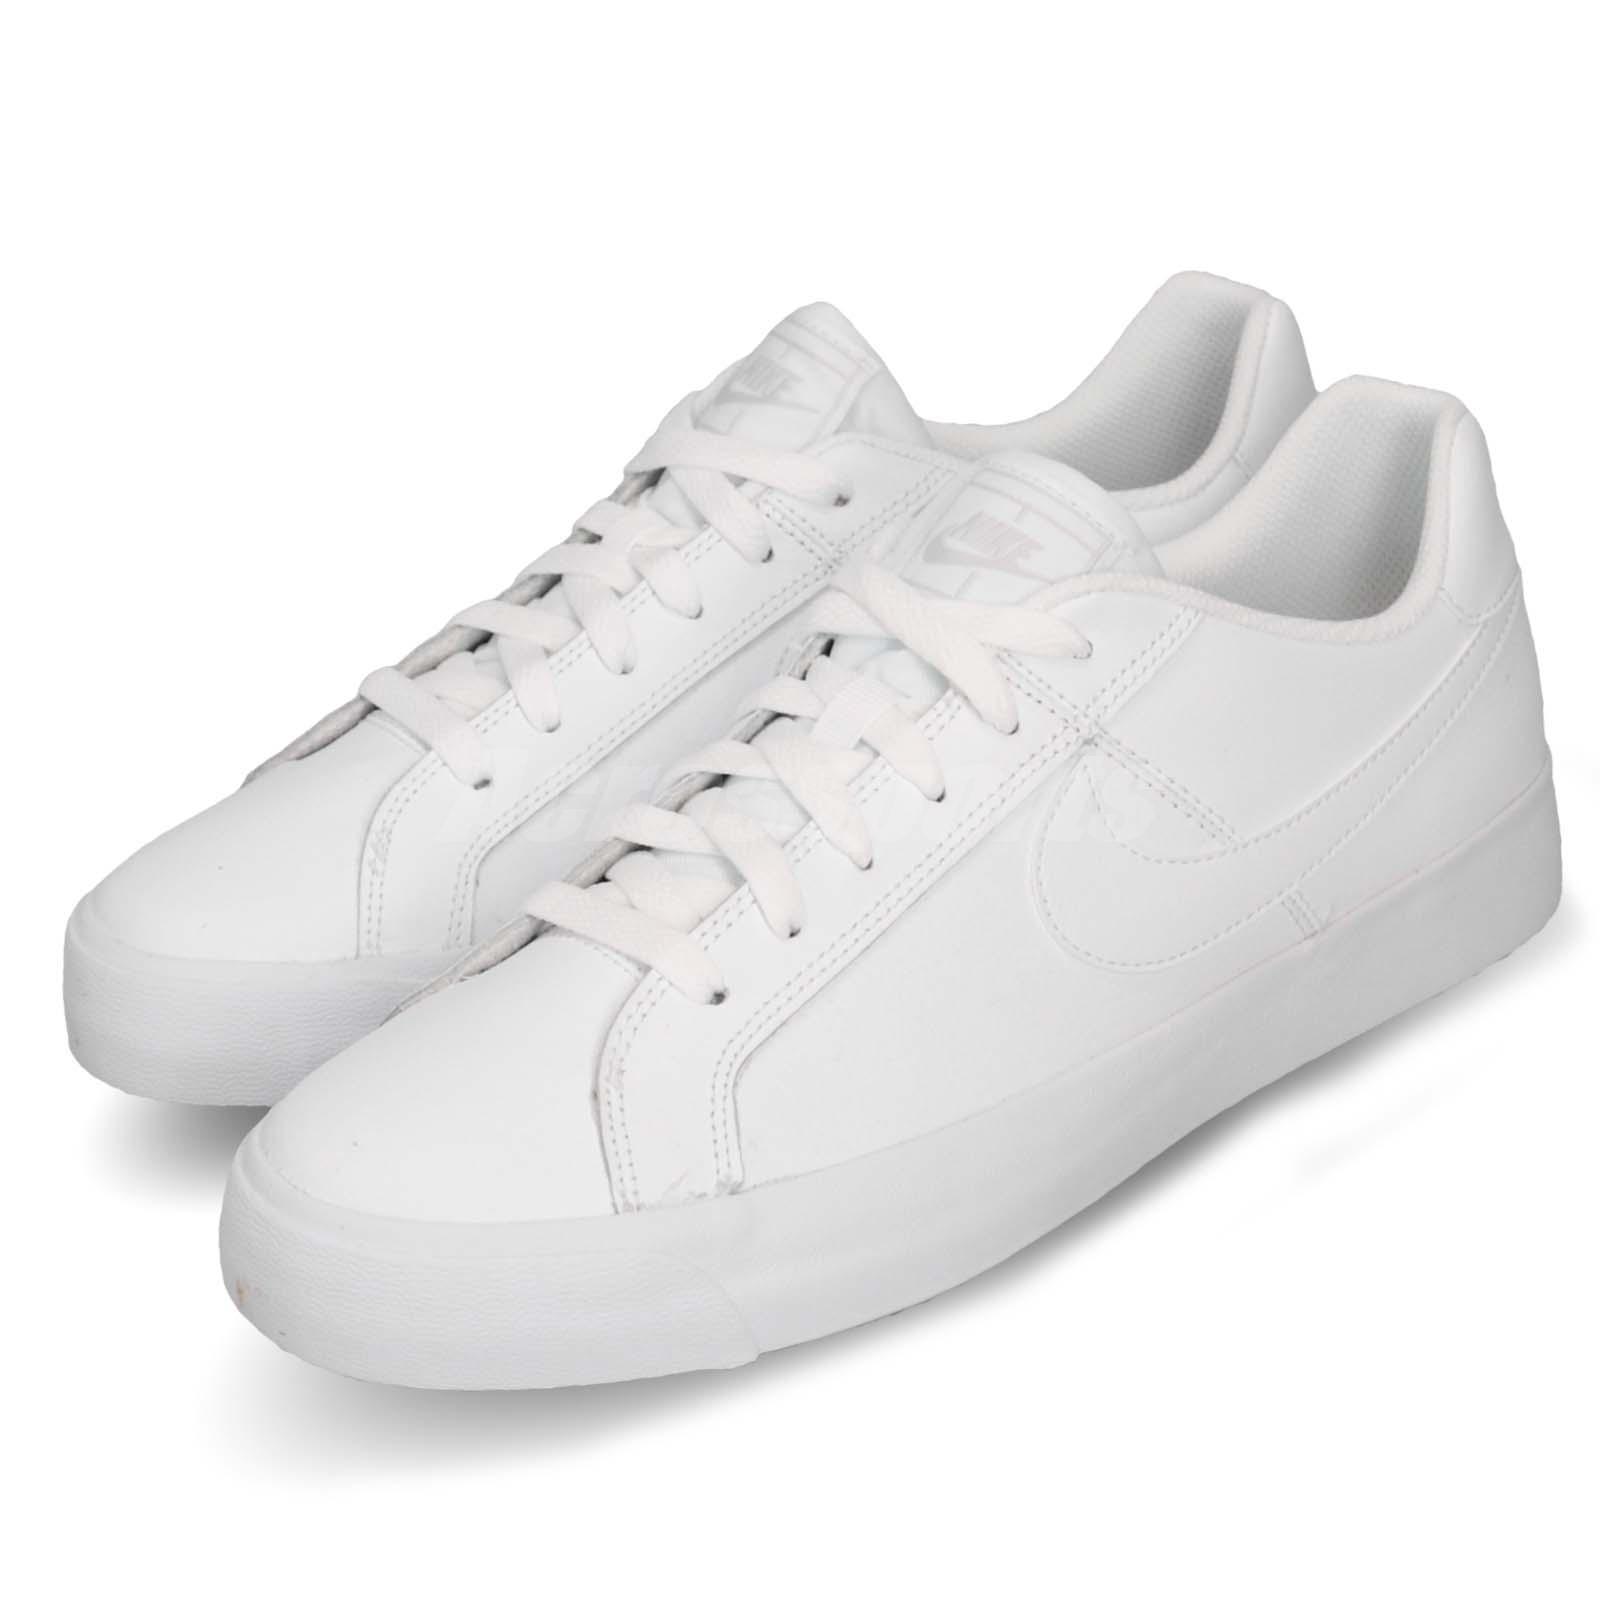 a pesar de Seguid así Patético  Nike Court Royale AC Blanco Gris Goma Clásico De Hombre Zapatos informales  Tenis BQ4222-101 | eBay